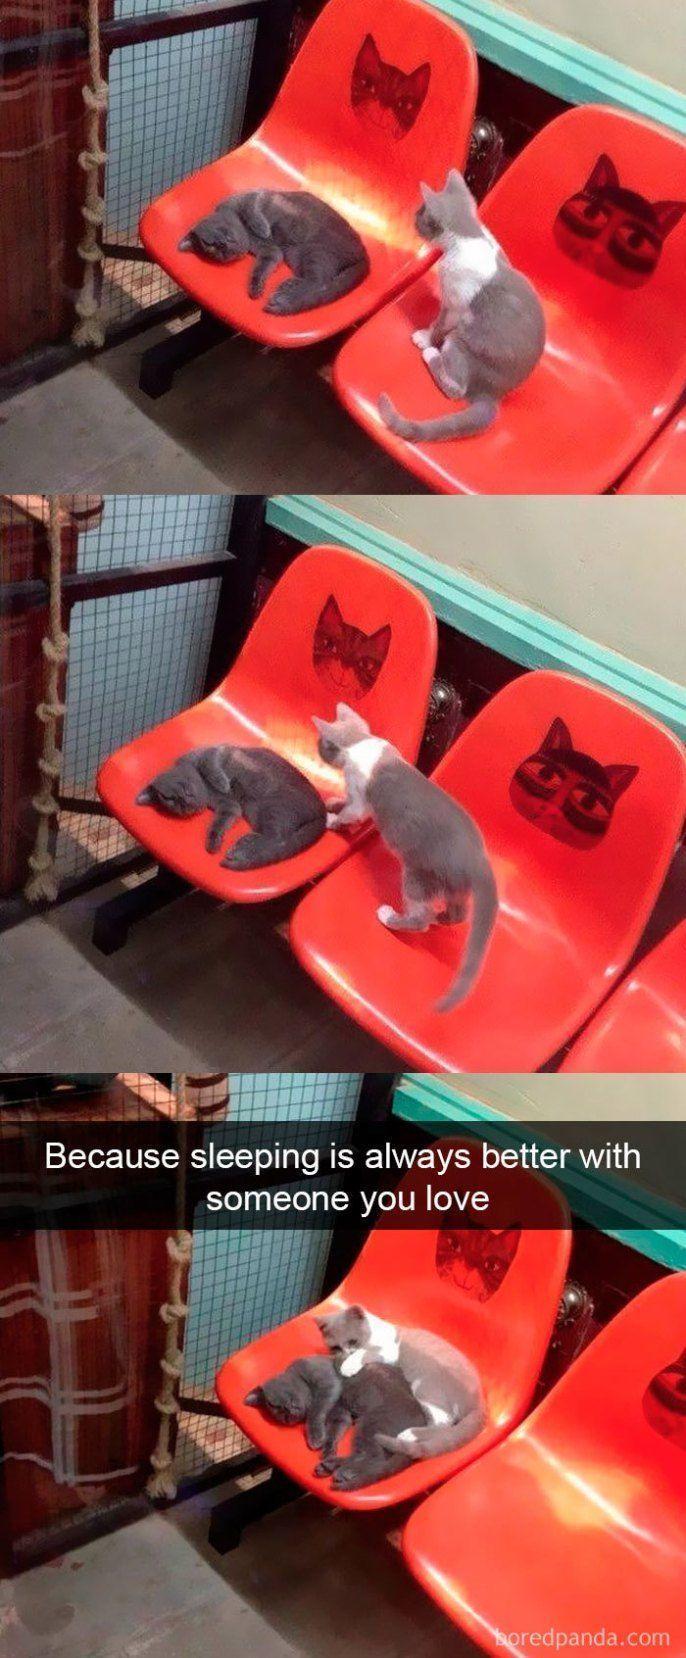 25+ Funniest Cat Snapchats That Will Leave You With The Biggest Smile - Mariska Vogelenzang de Jong - Katzen -